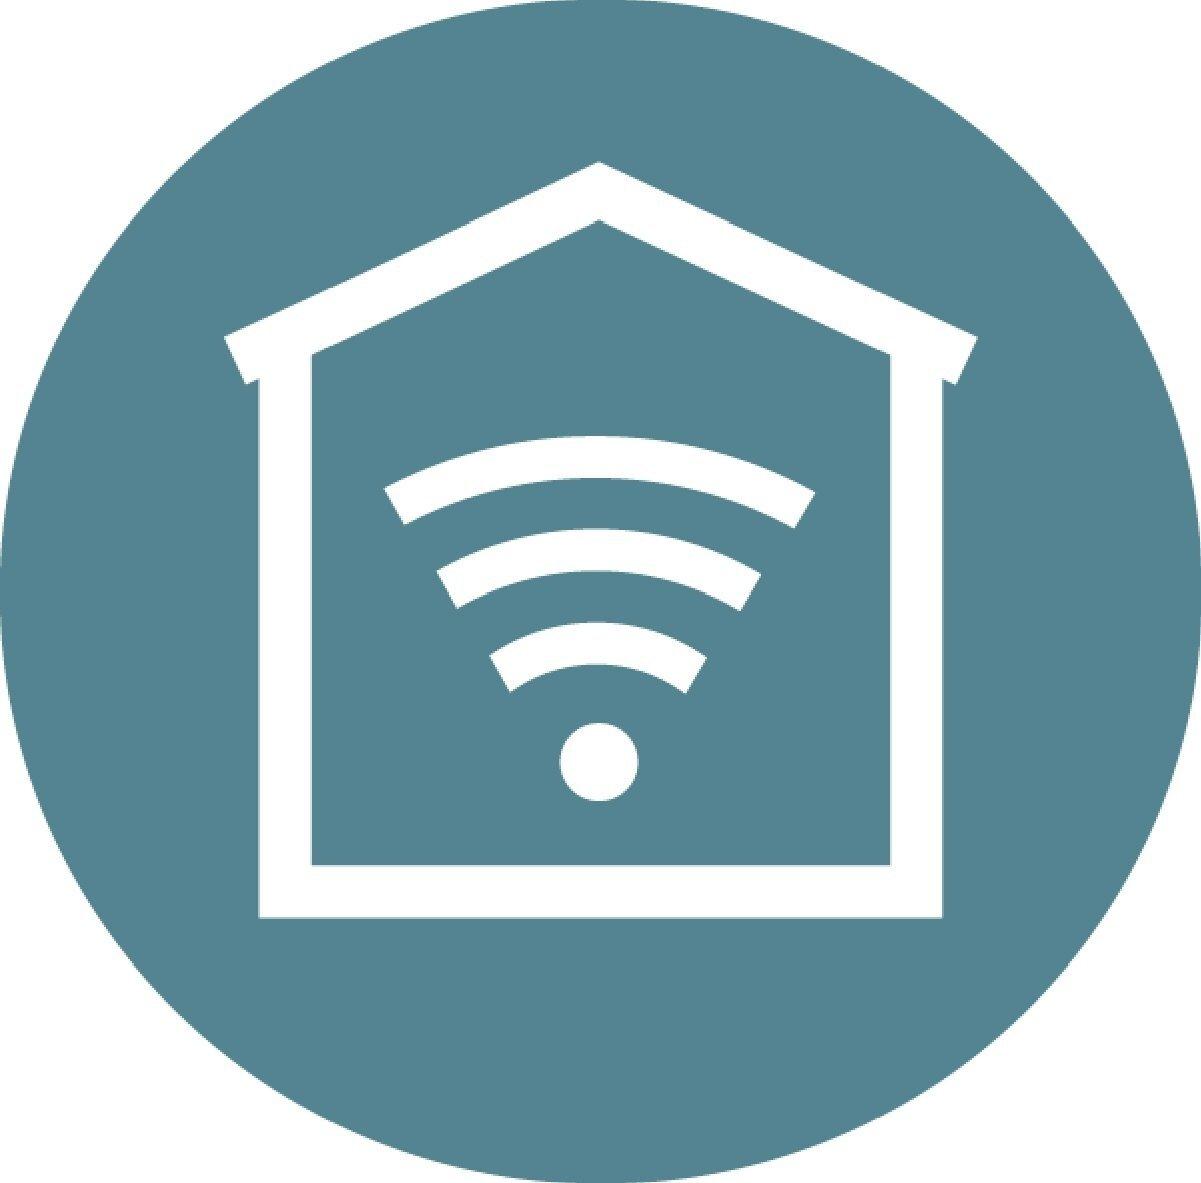 picto smart home oth 1 CI15284 - Robot Aspirador karcher  RC 3. 1.198-203.0